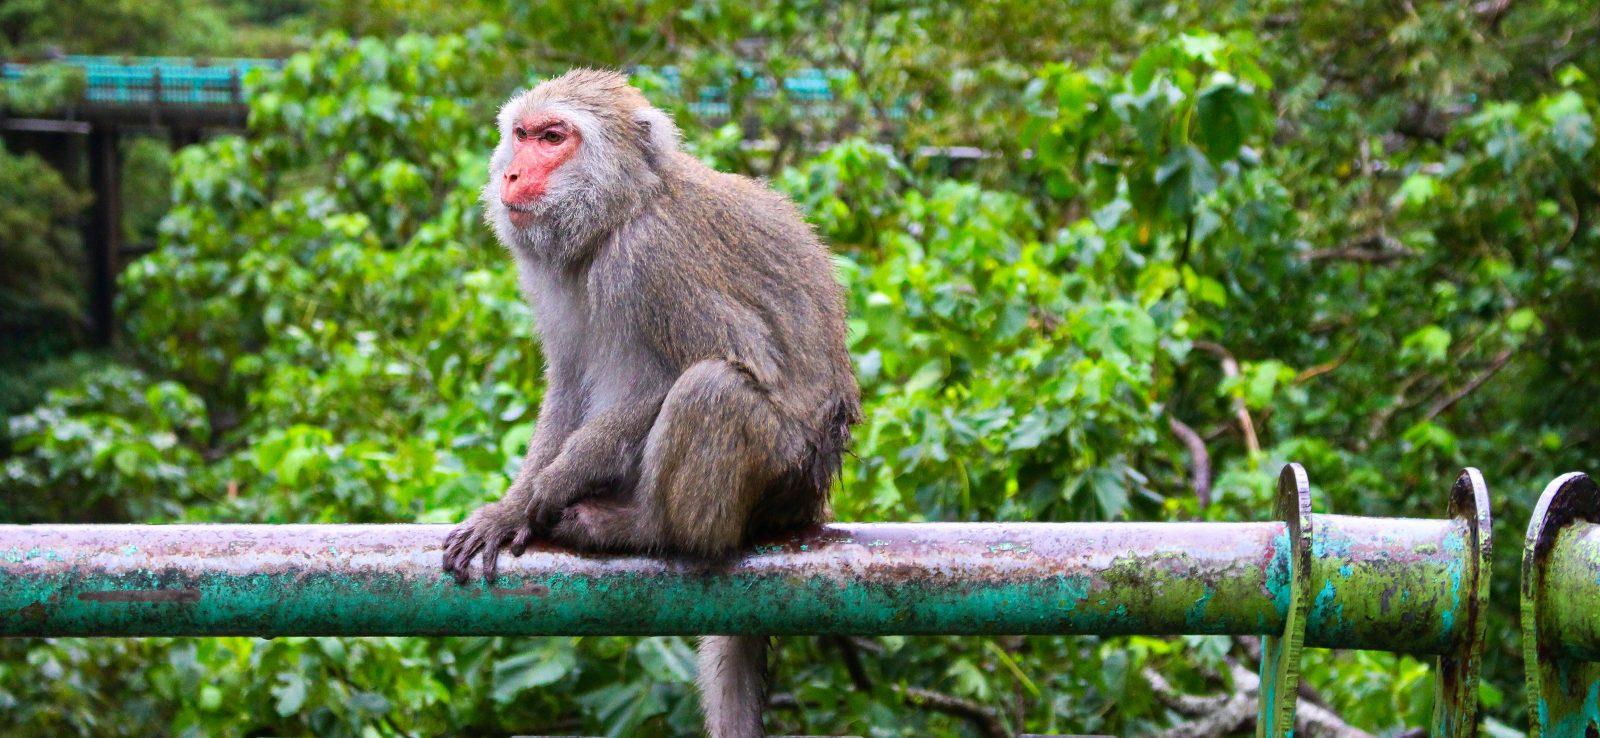 Taitung East Coast Explorer: Dulan, Sanxiantai, Monkeys and More!